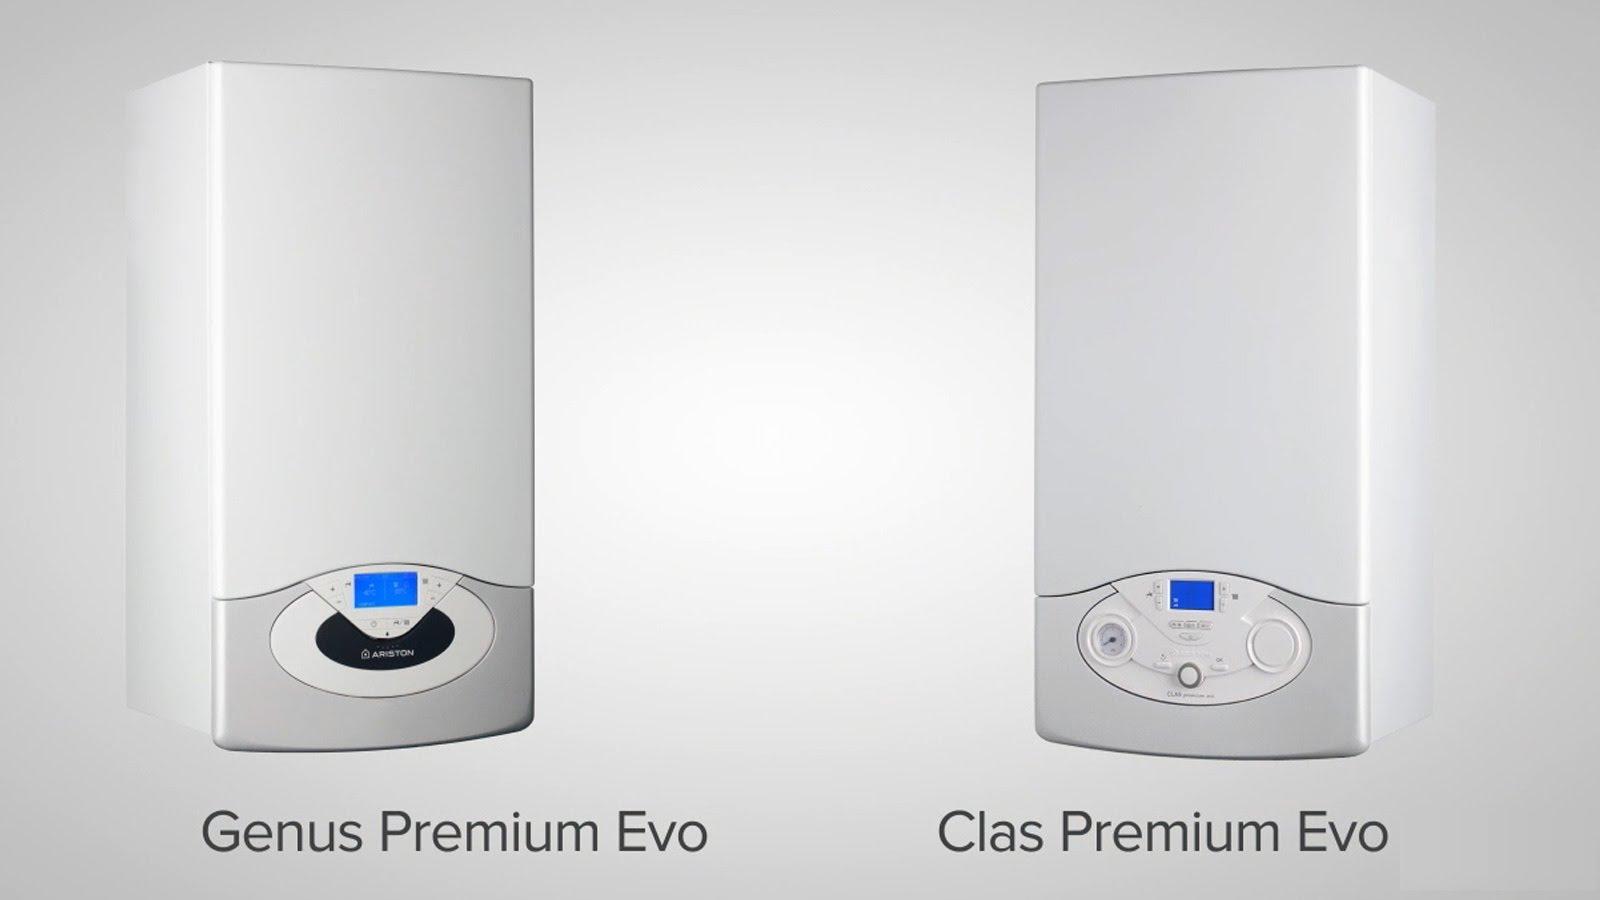 Ariston clas premium evo alkatr szek for Clas premium evo eu